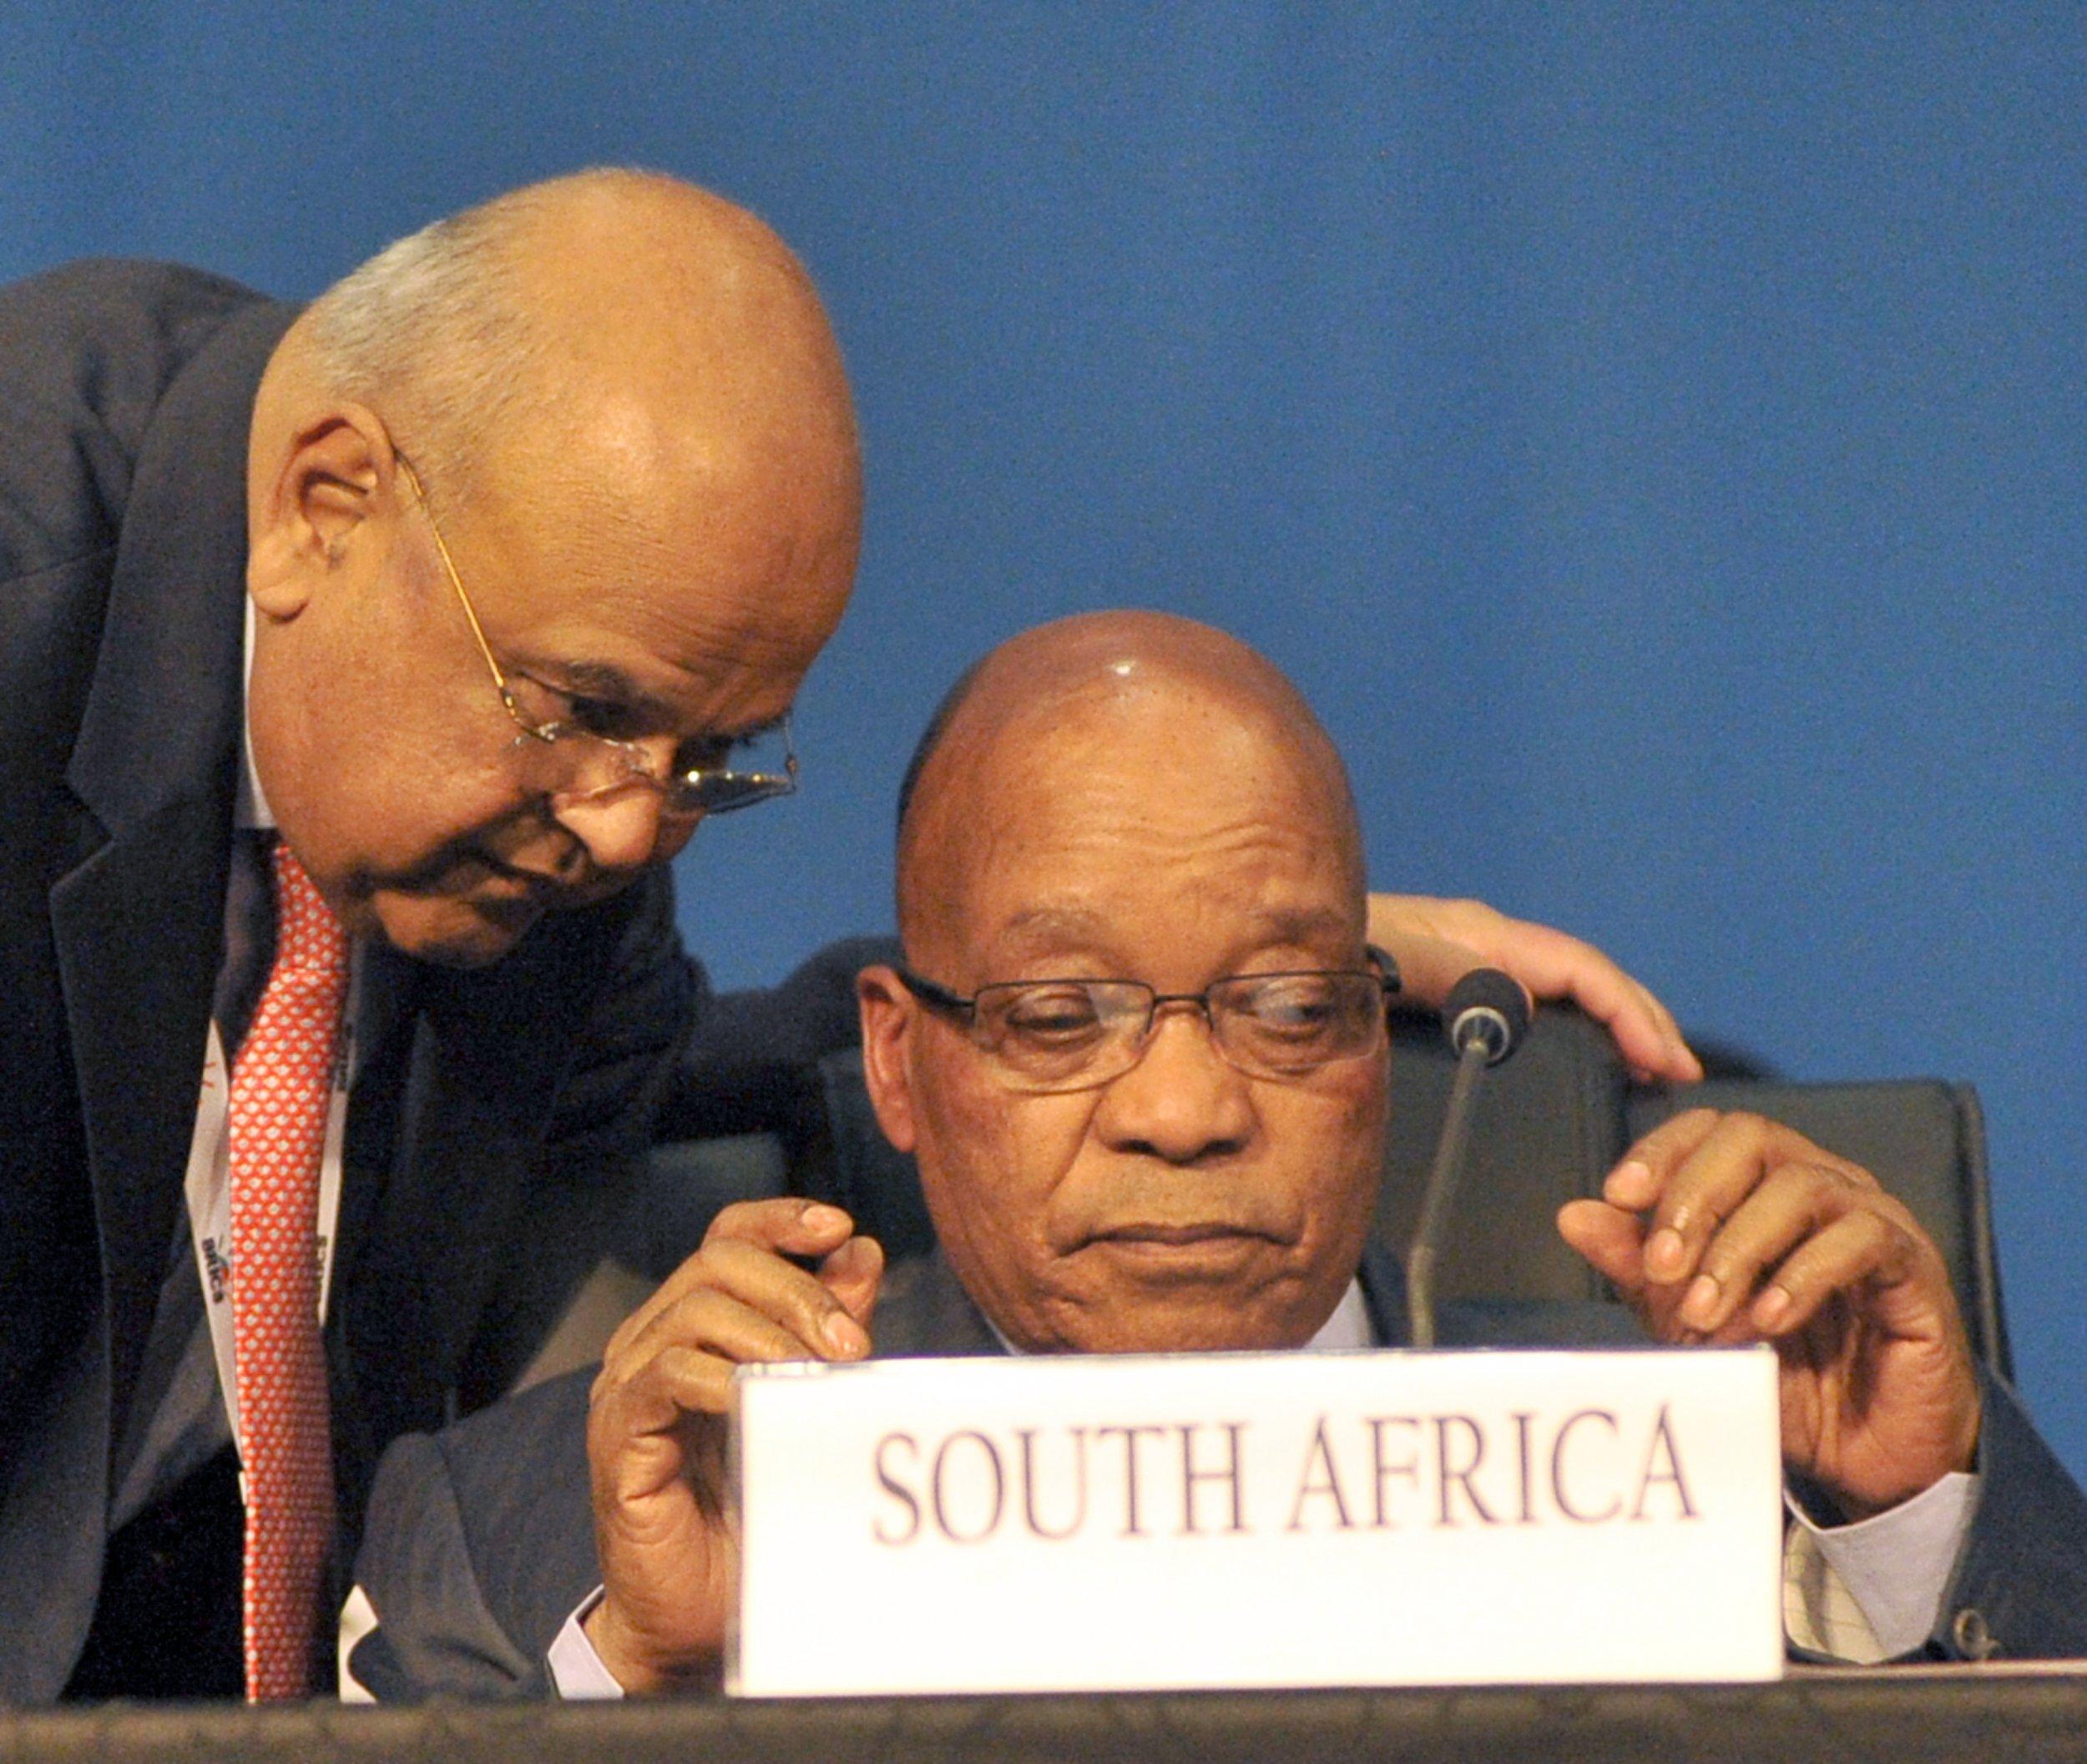 Jacob Zuma and Pravin Gordhan speak at a BRICS summit in Durban.